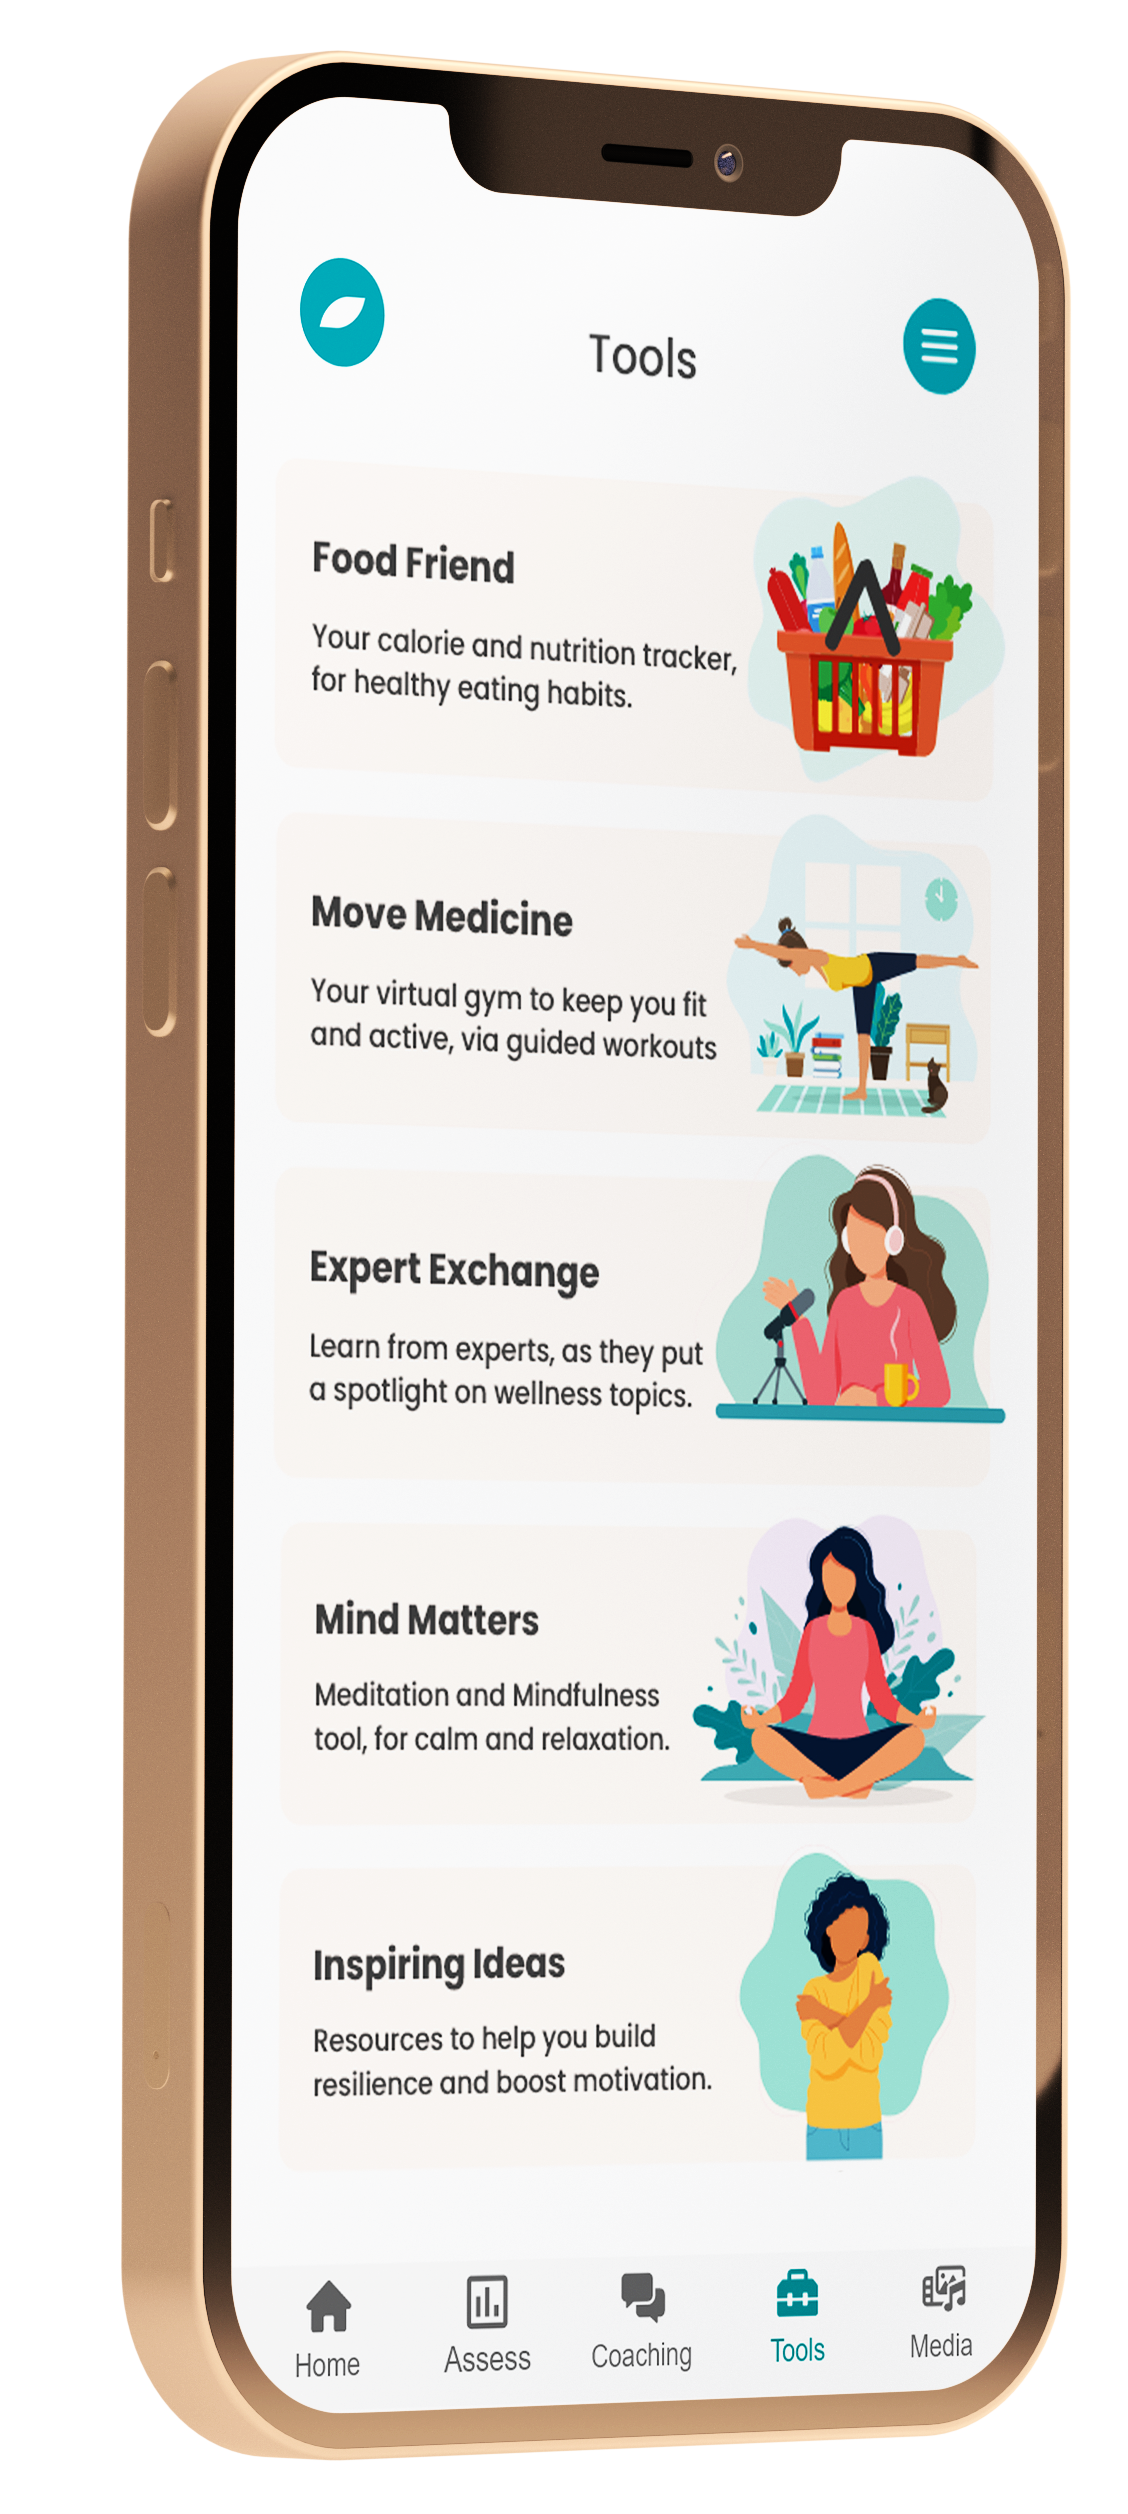 raiys wellness tools screenshot